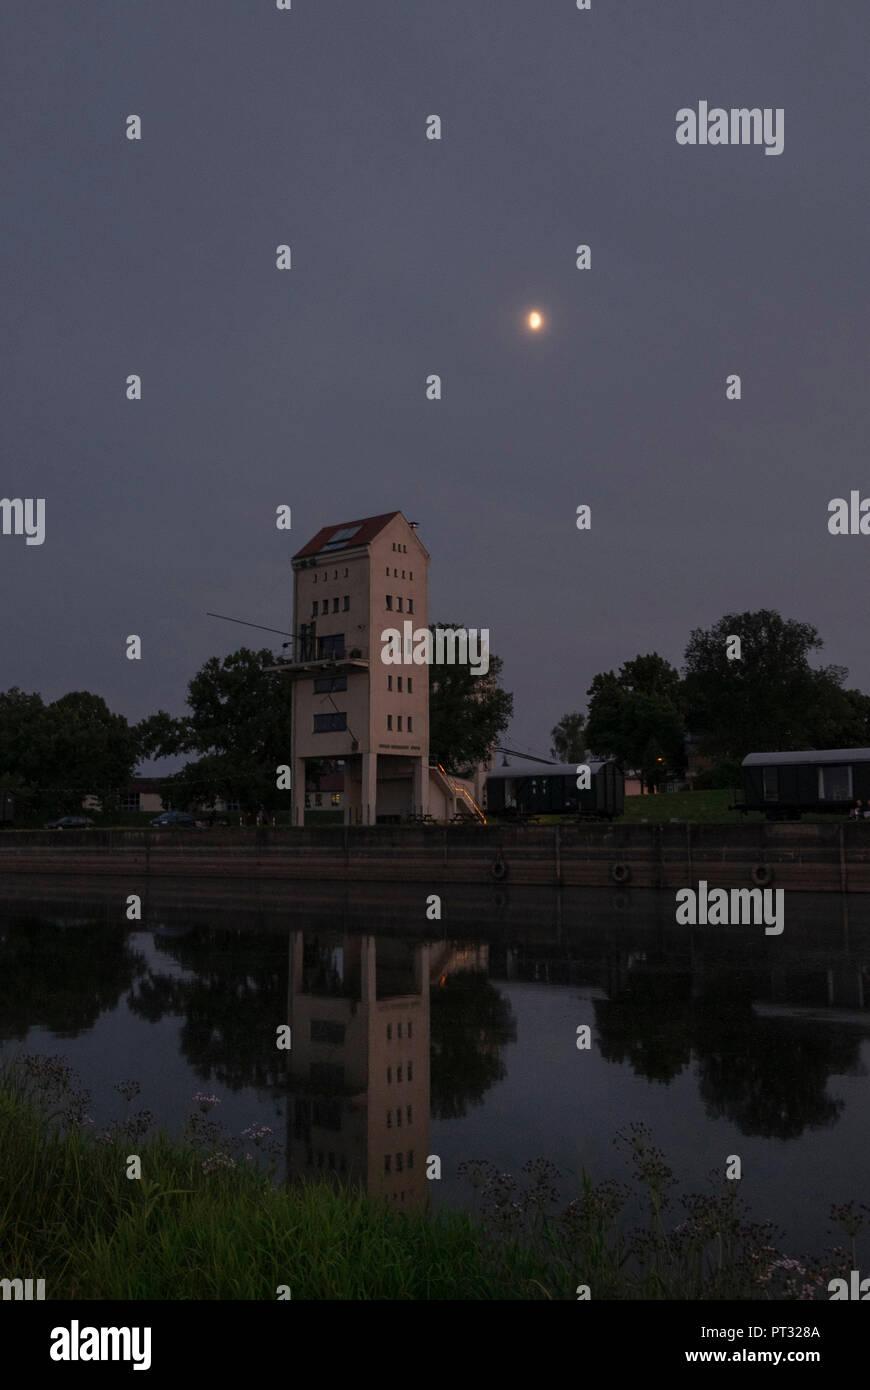 Kulturhafen Gross Neuendorf, loading tower, waggons, moon, Oderbruch, Brandenburg, Germany - Stock Image